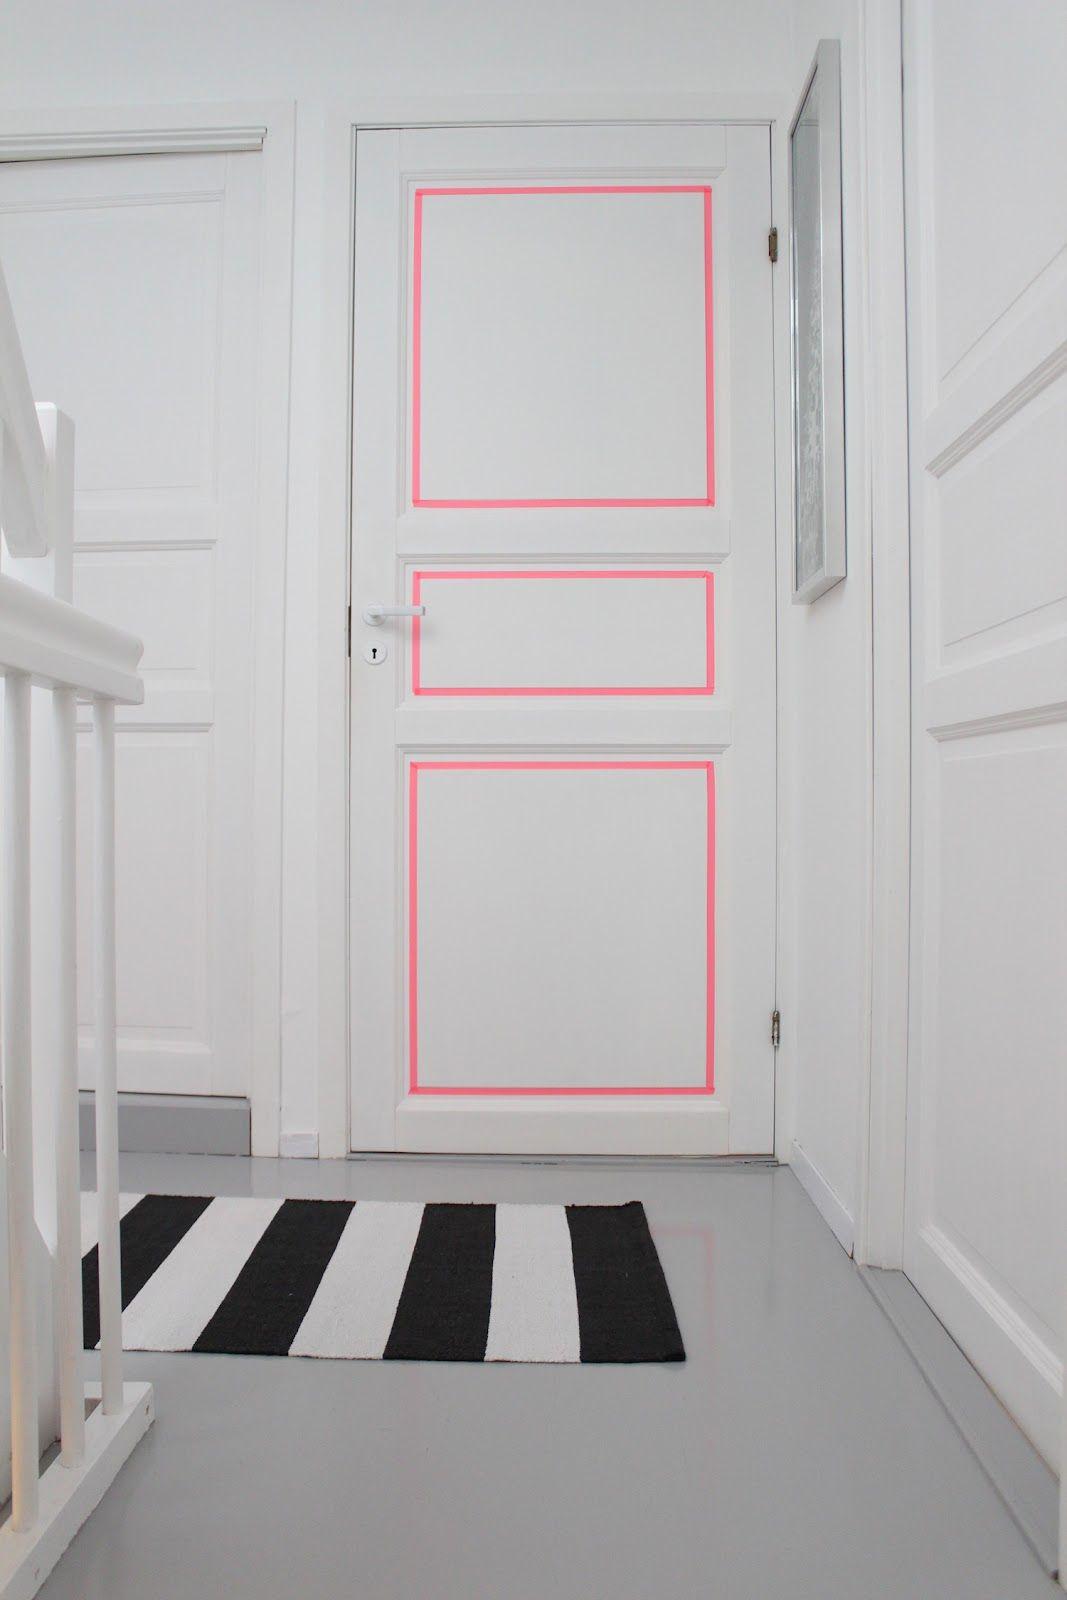 d corer une porte avec du masking tape relooker mon. Black Bedroom Furniture Sets. Home Design Ideas